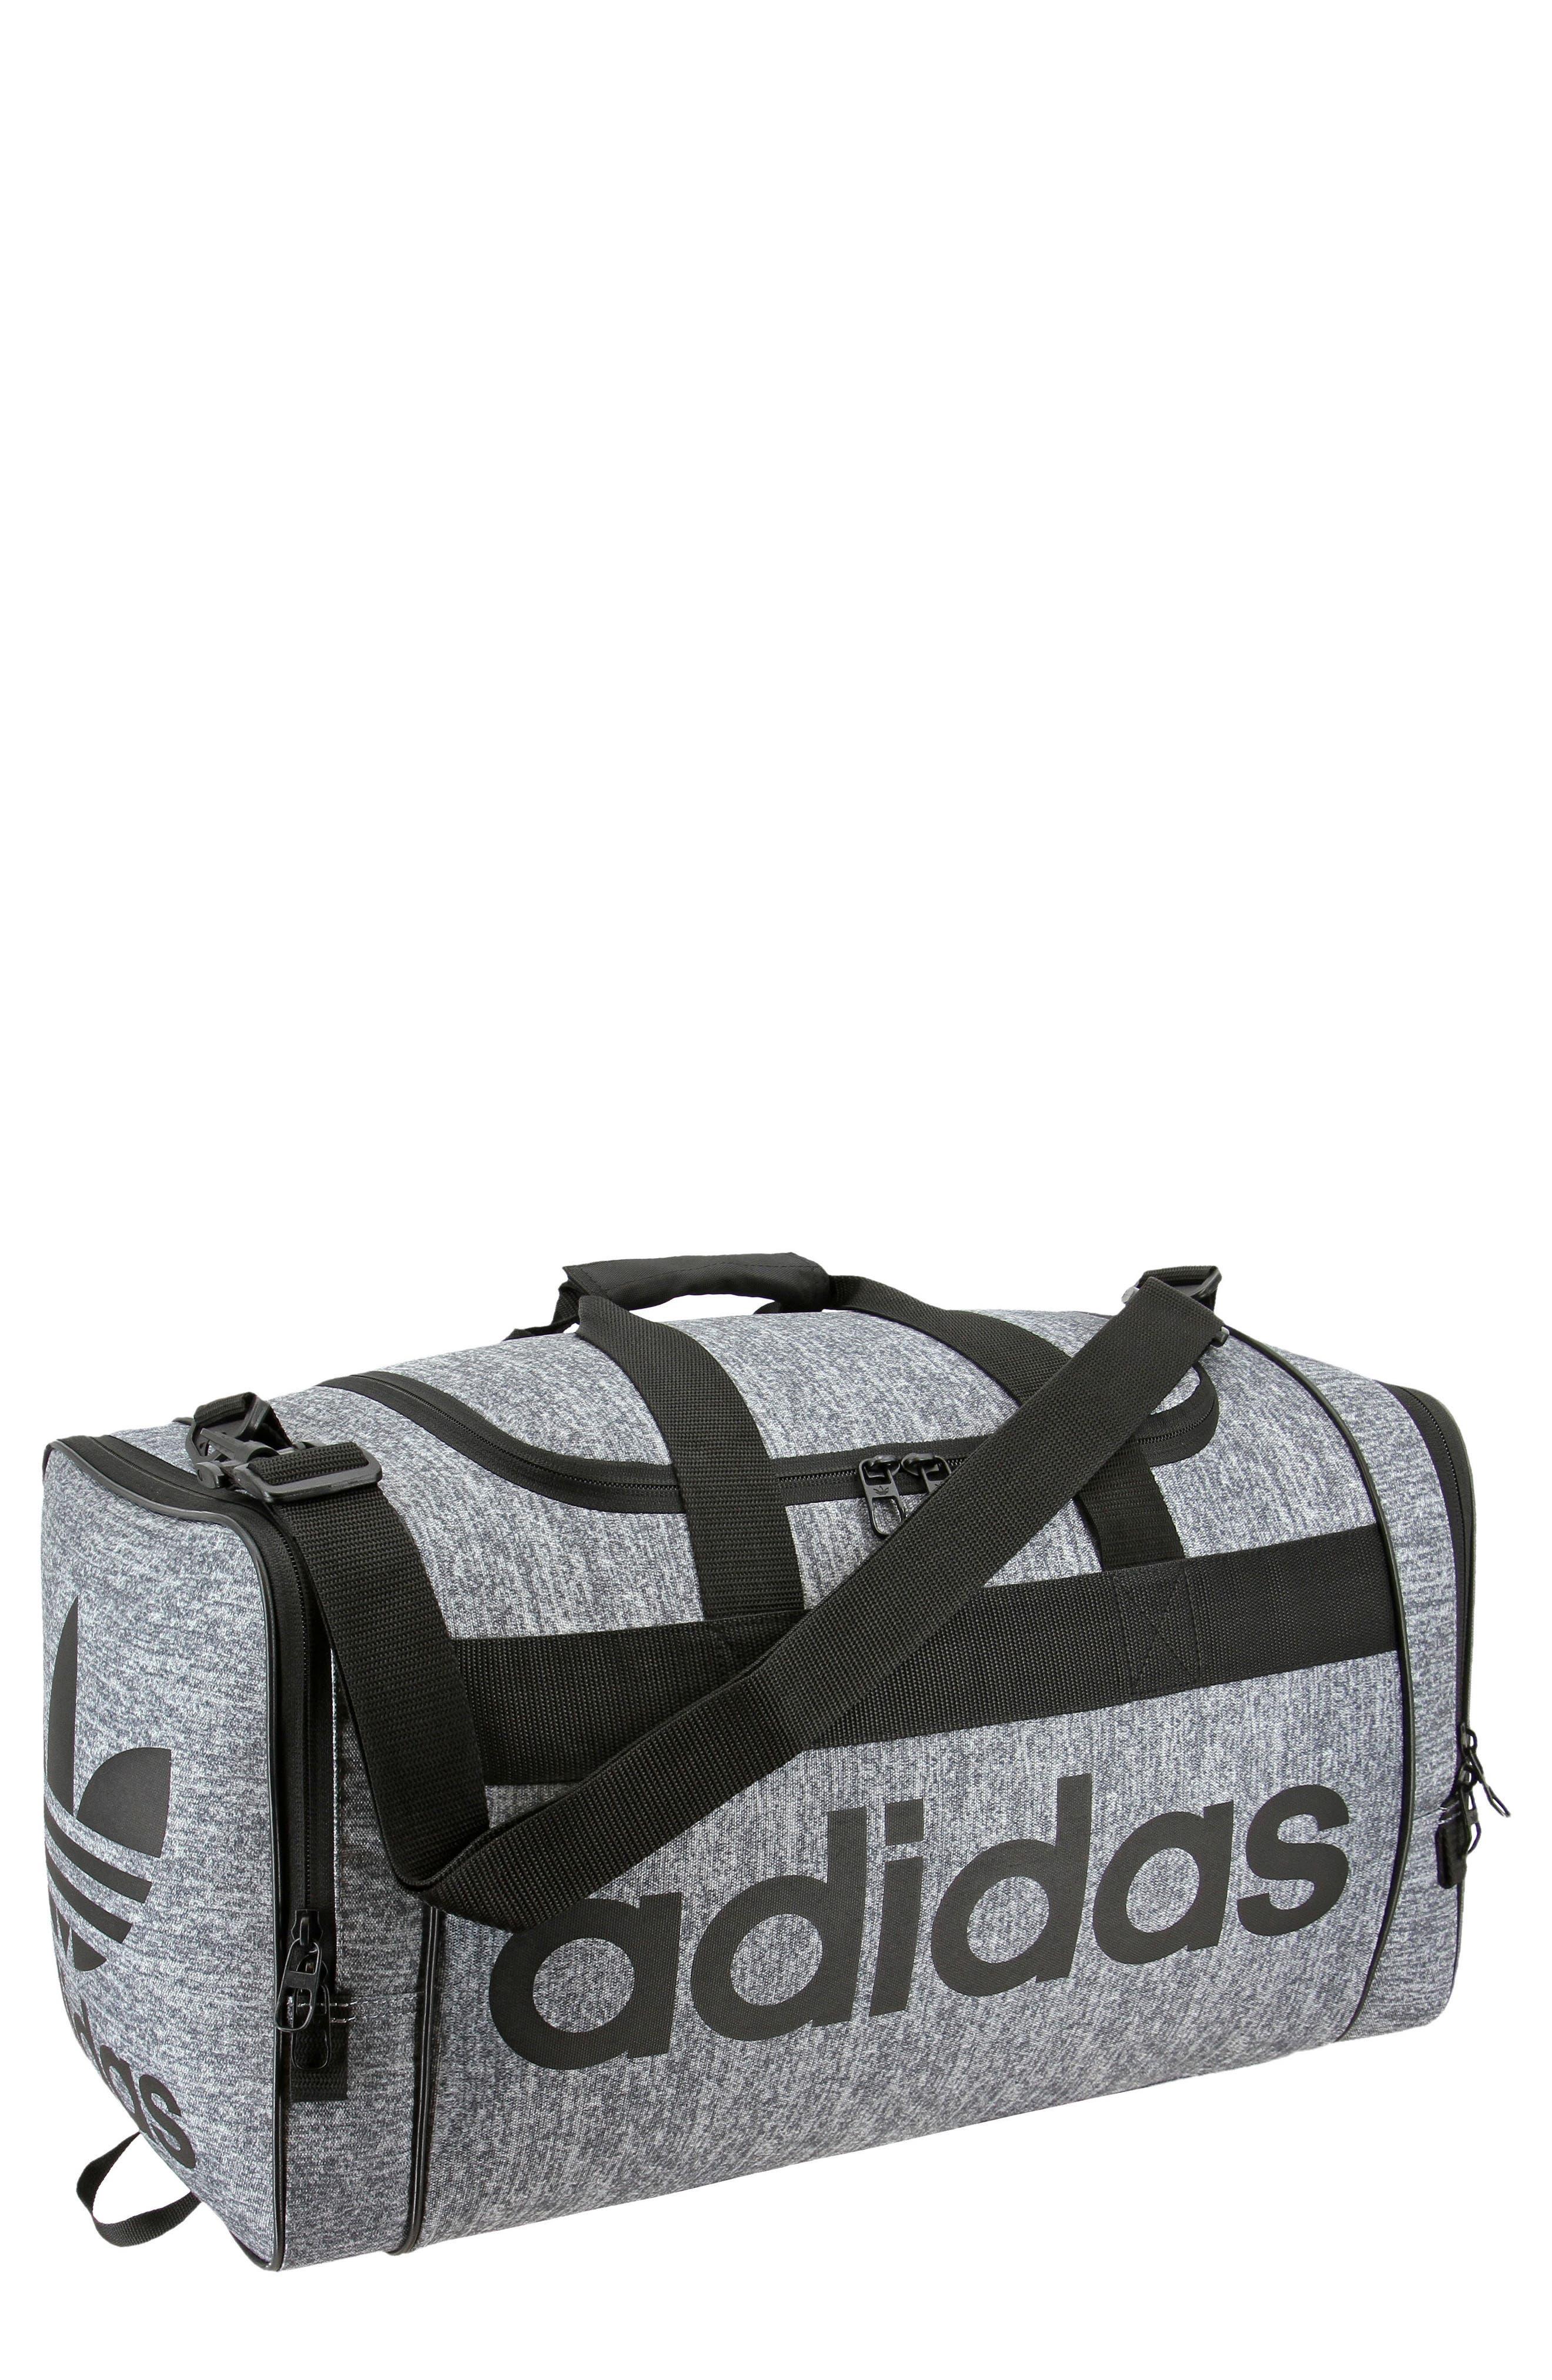 Santiago Duffel Bag,                         Main,                         color, Med Grey